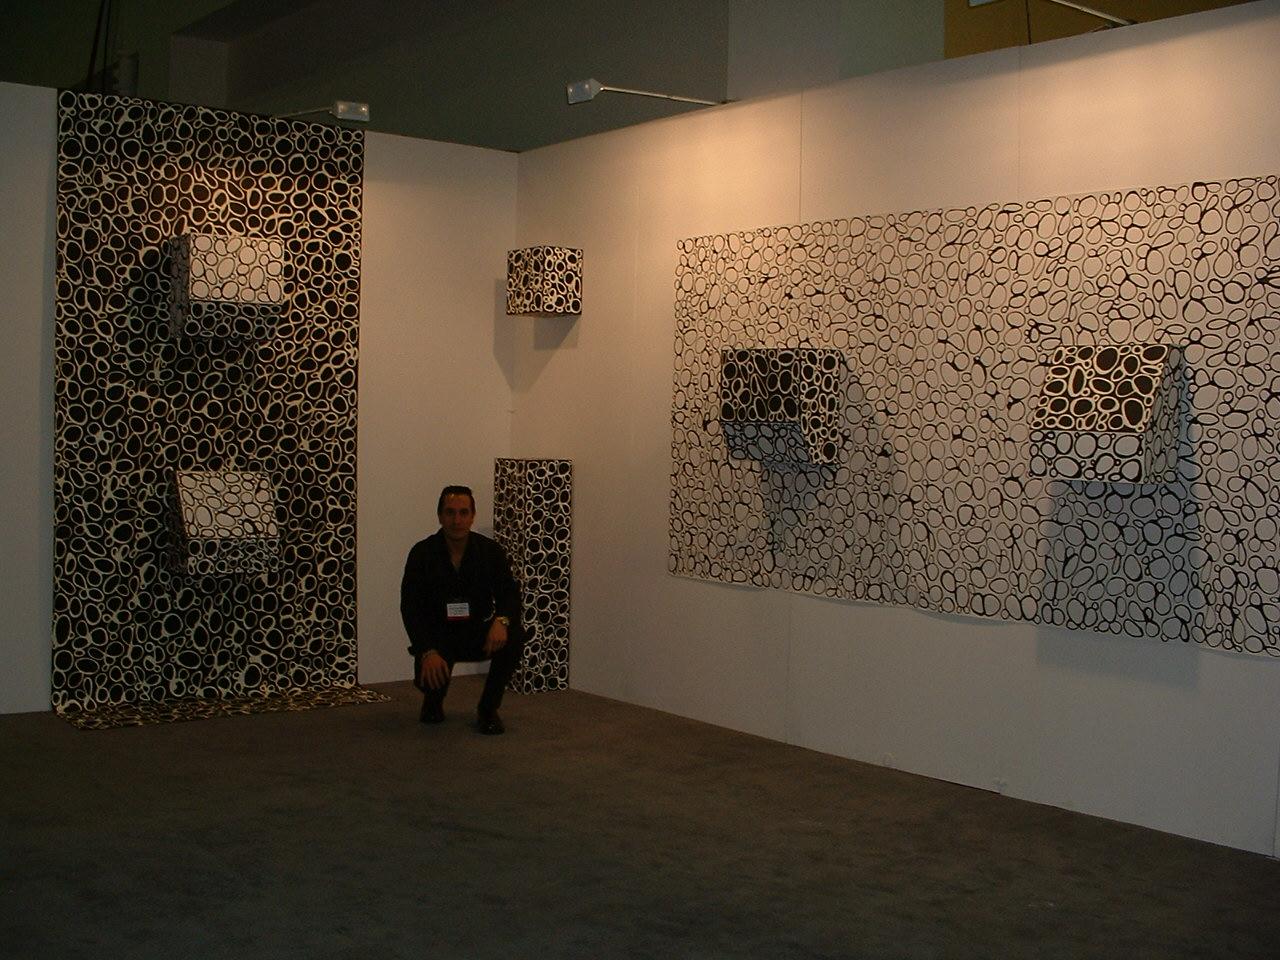 Art New York Art Fair 2004: Ying-Yang. Installation. Dimension variables. 2004